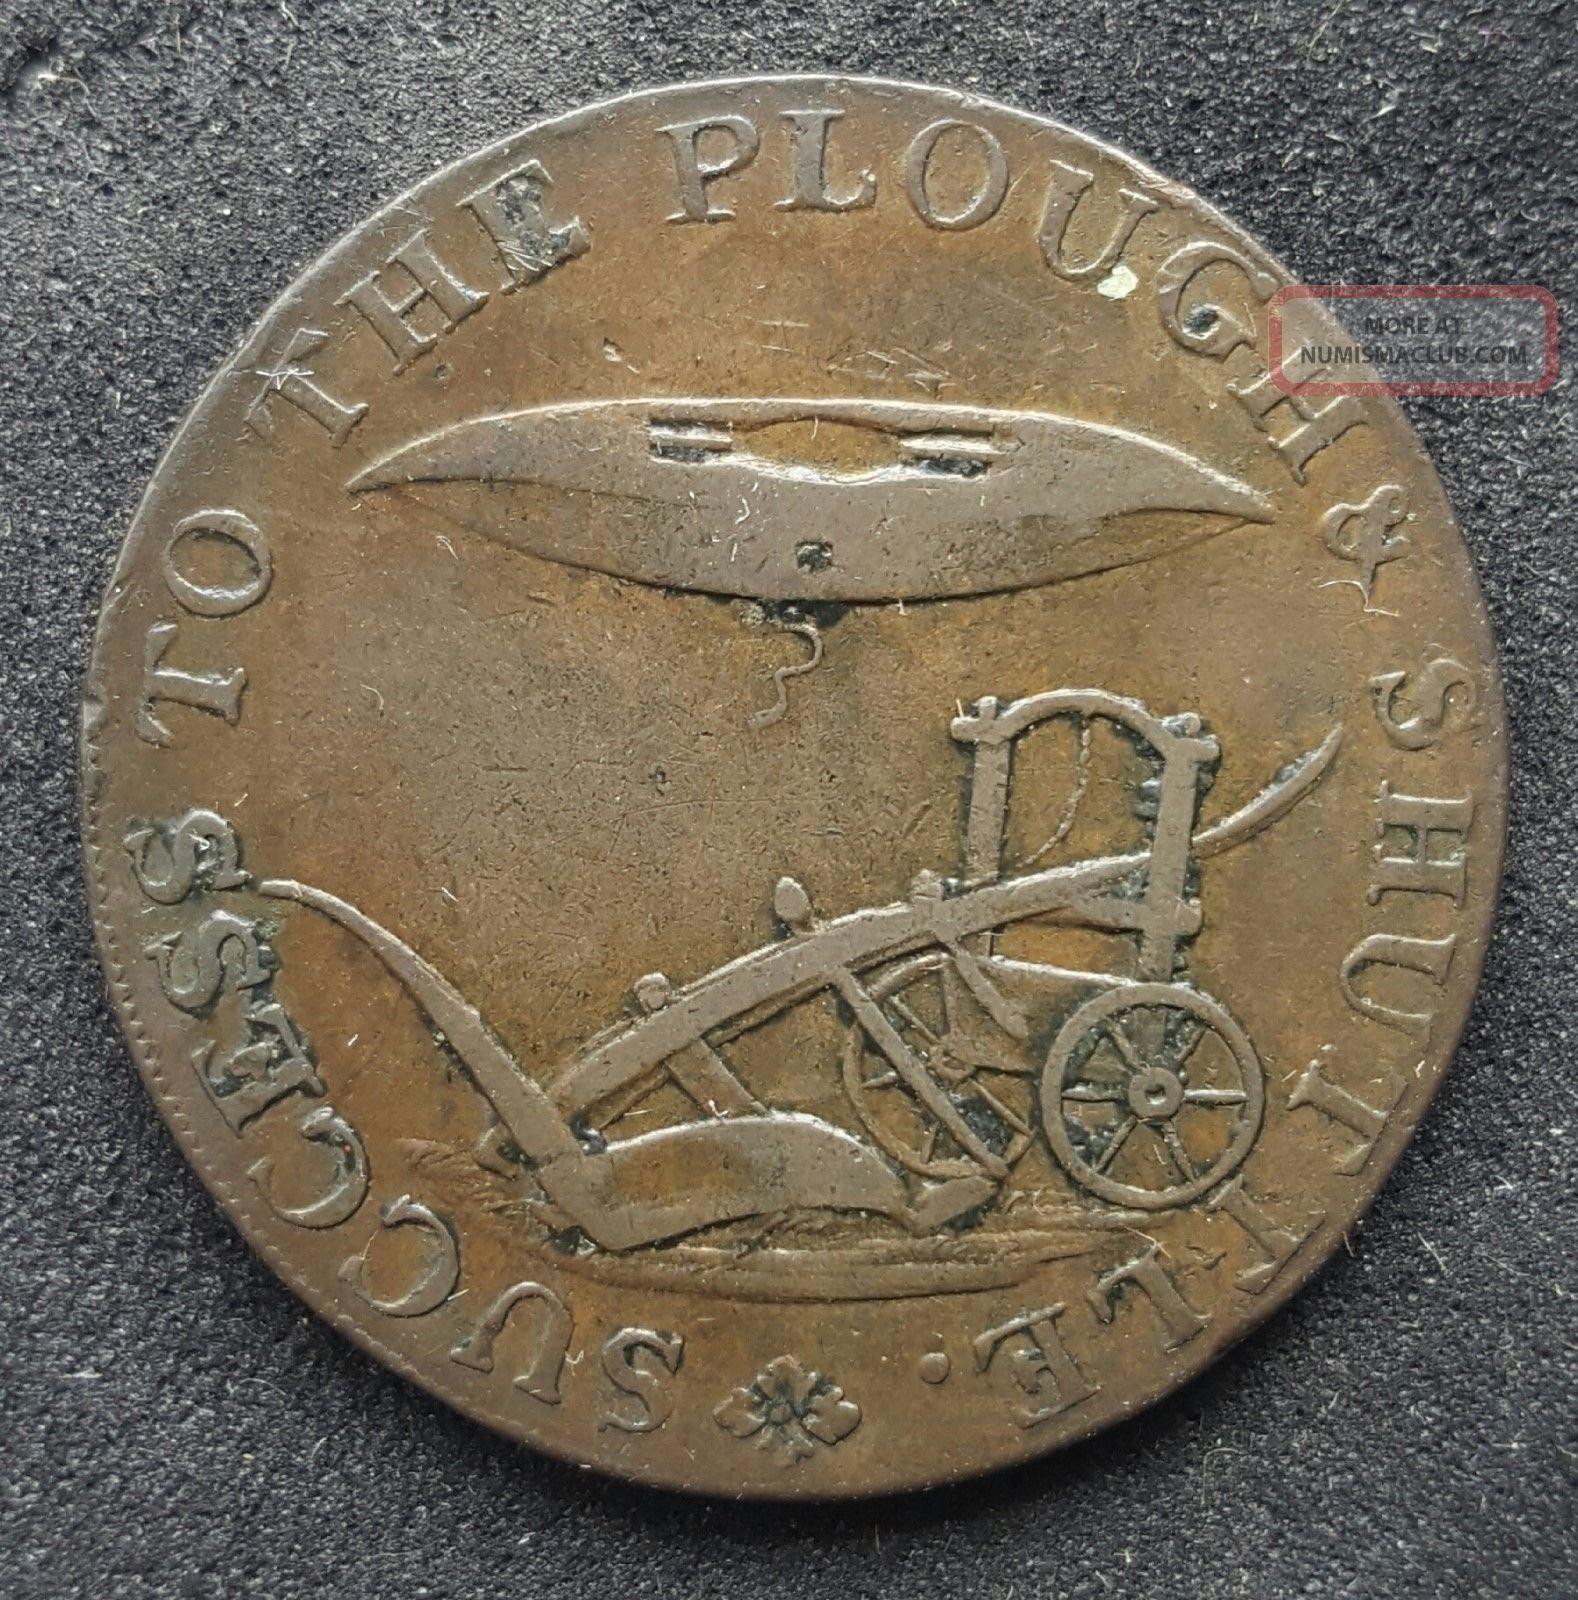 1794 Great Britain Norfolk Norwich Half Penny Conder Token D&h 19 UK (Great Britain) photo